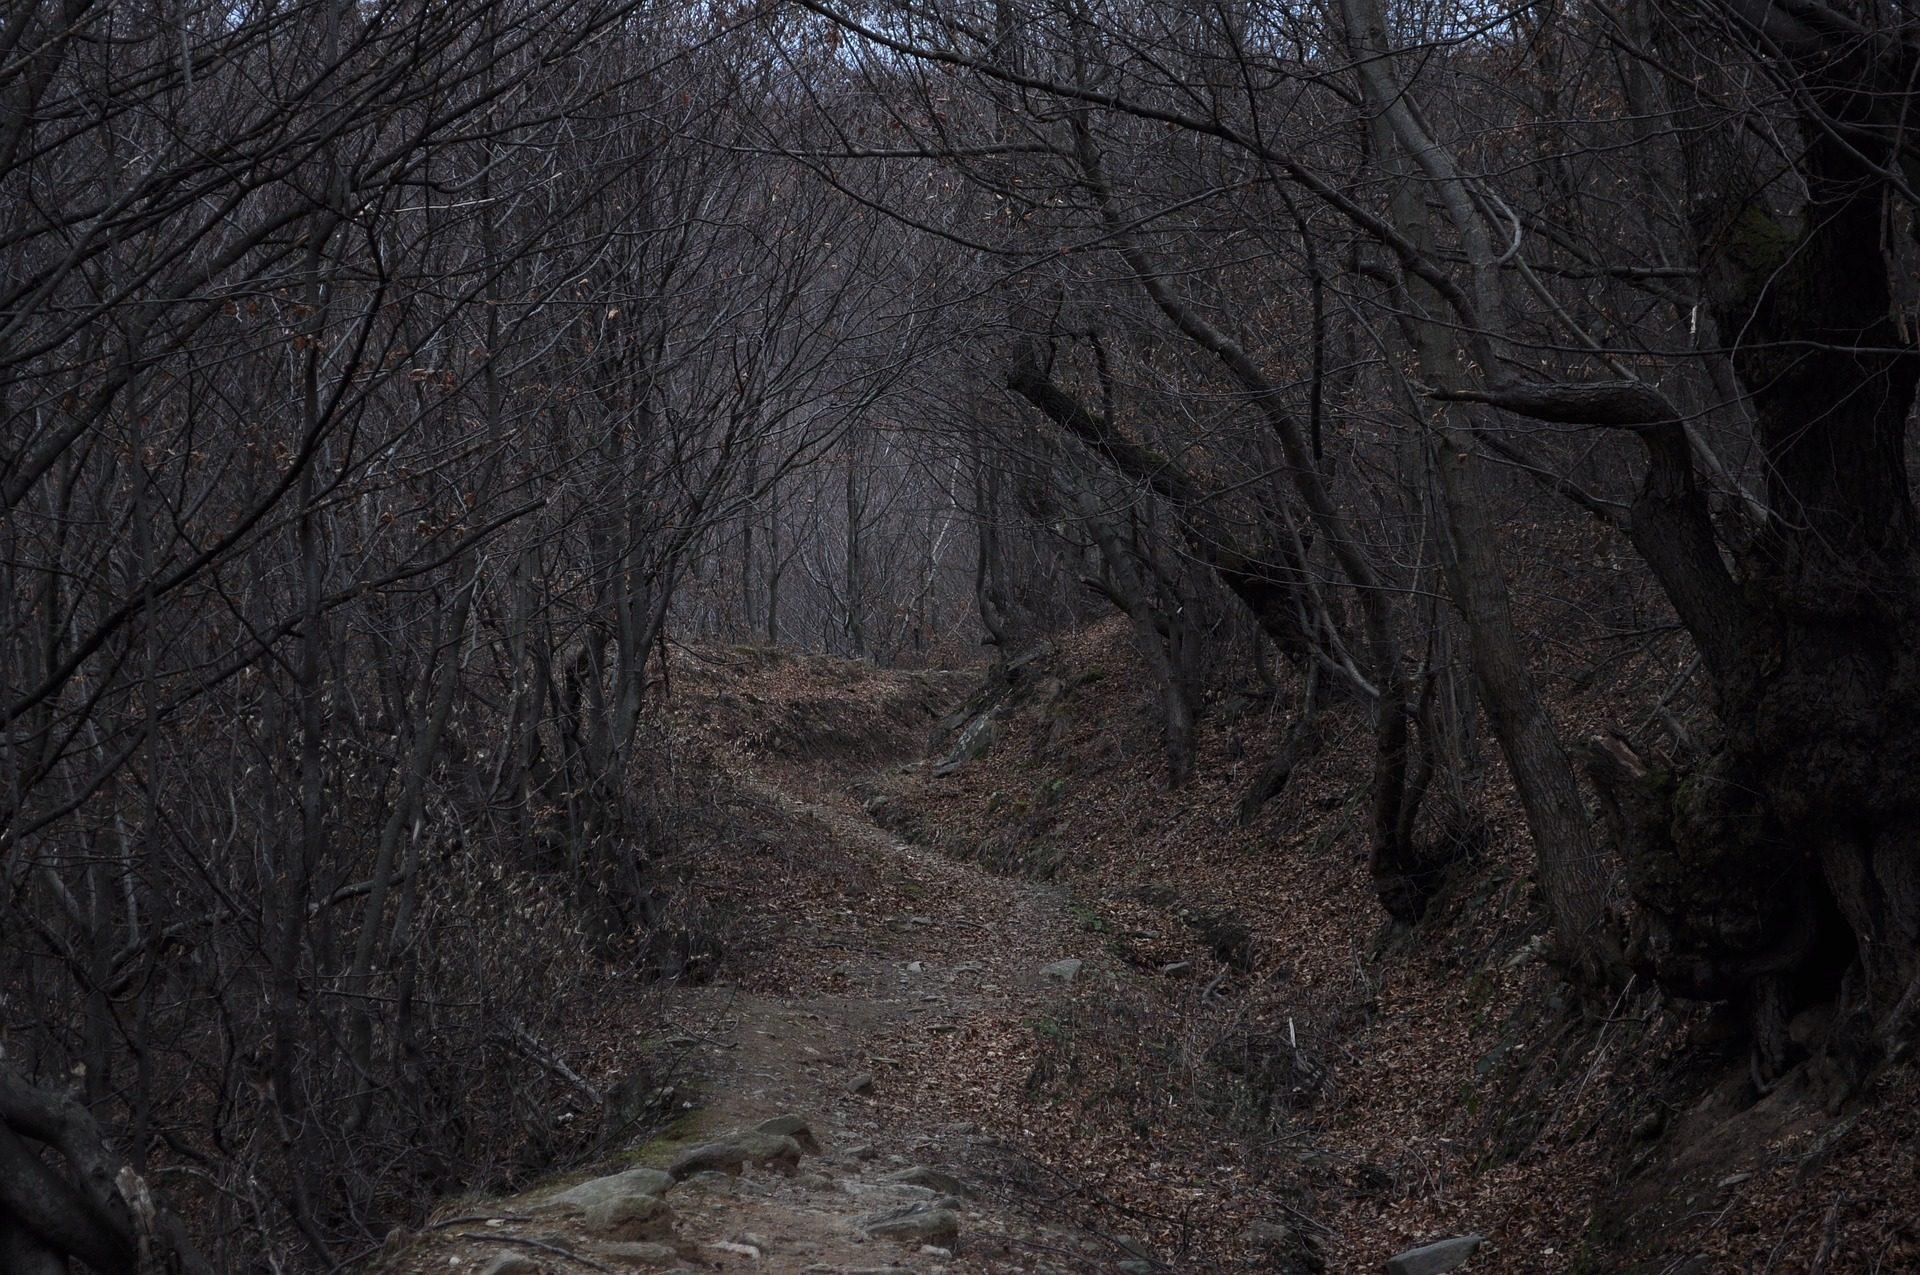 सड़क, वन, अंधेरे, पेड़, डर - HD वॉलपेपर - प्रोफेसर-falken.com